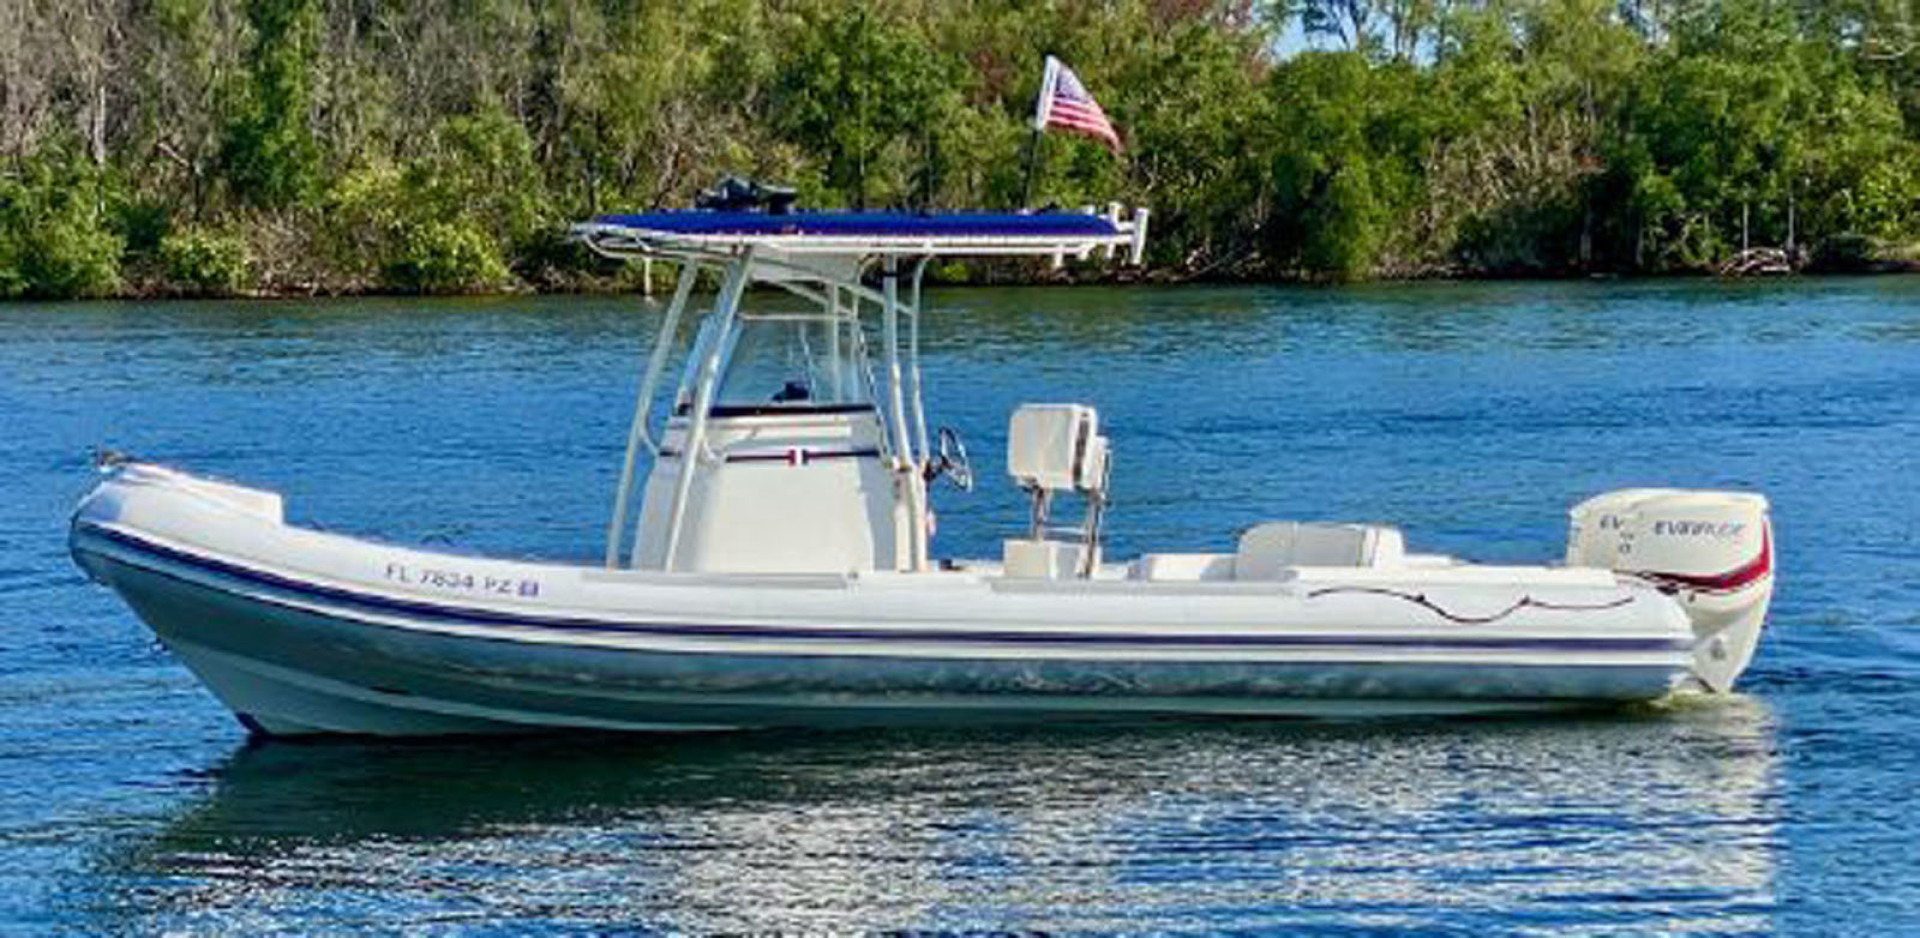 Flexboat-SR760LL 2014-No Name Boca Raton-Florida-United States-1555809 | Thumbnail